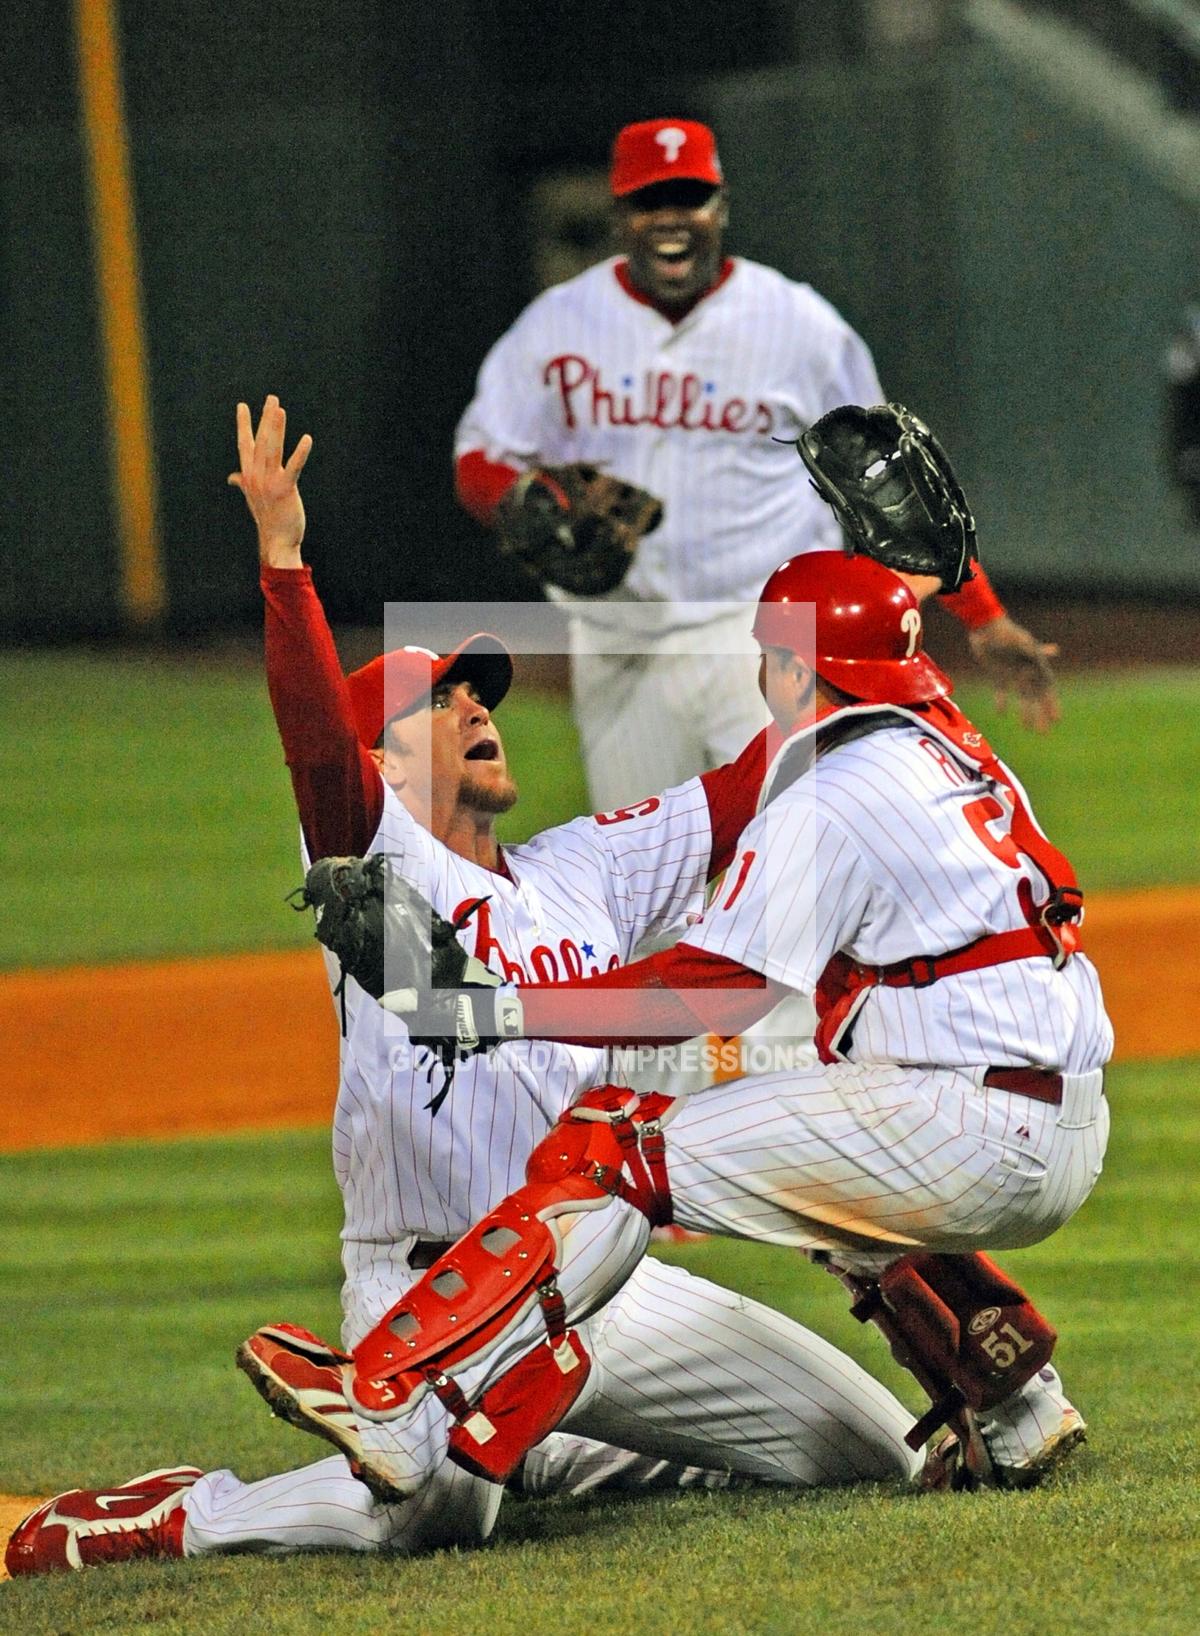 Phillies Brad Lidge Celebrates 2008 World Series Victory